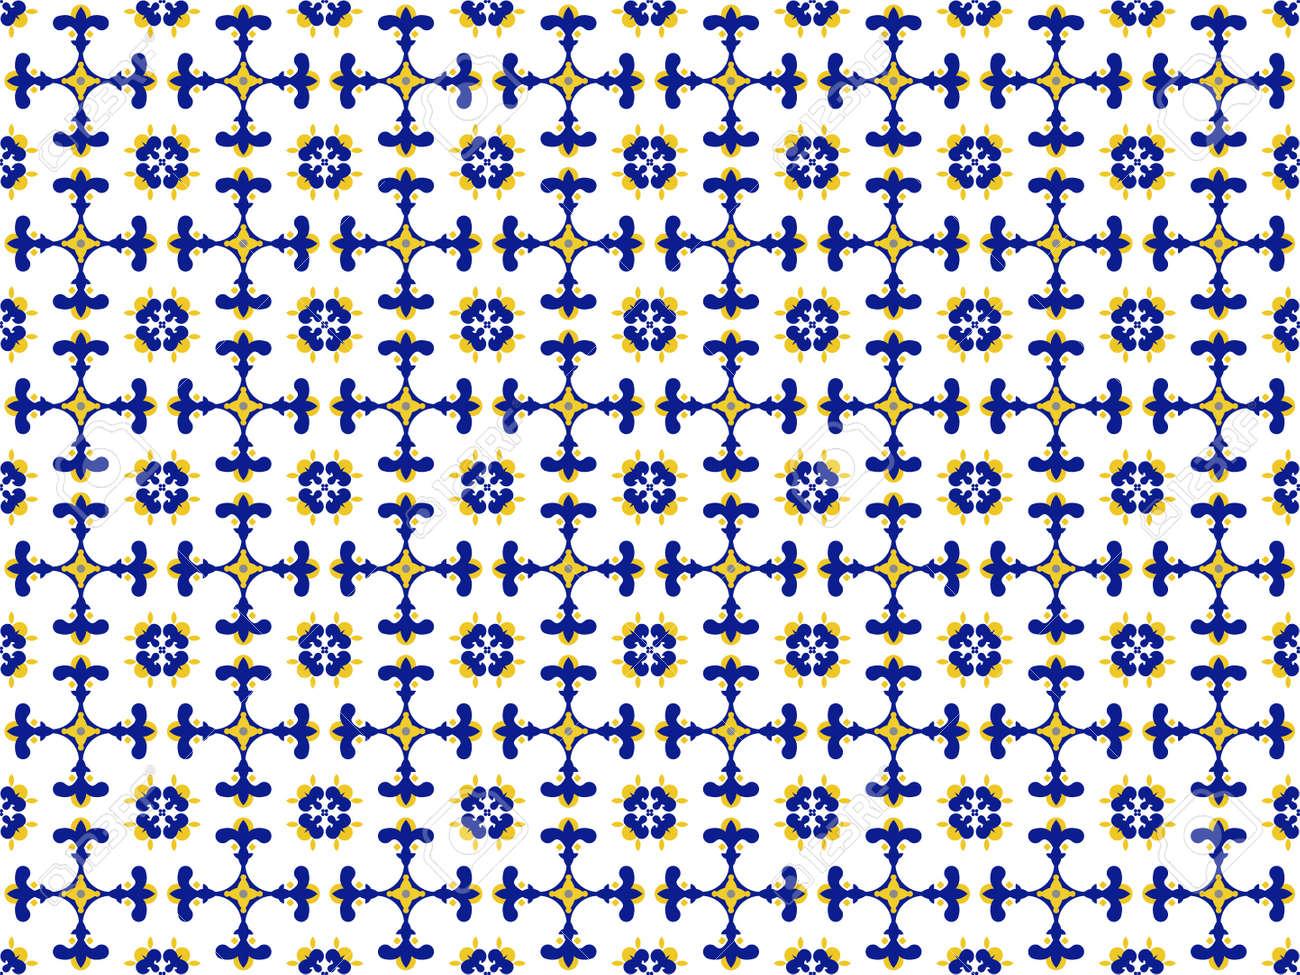 Azulejos Portuguese tile floor pattern - 173114922